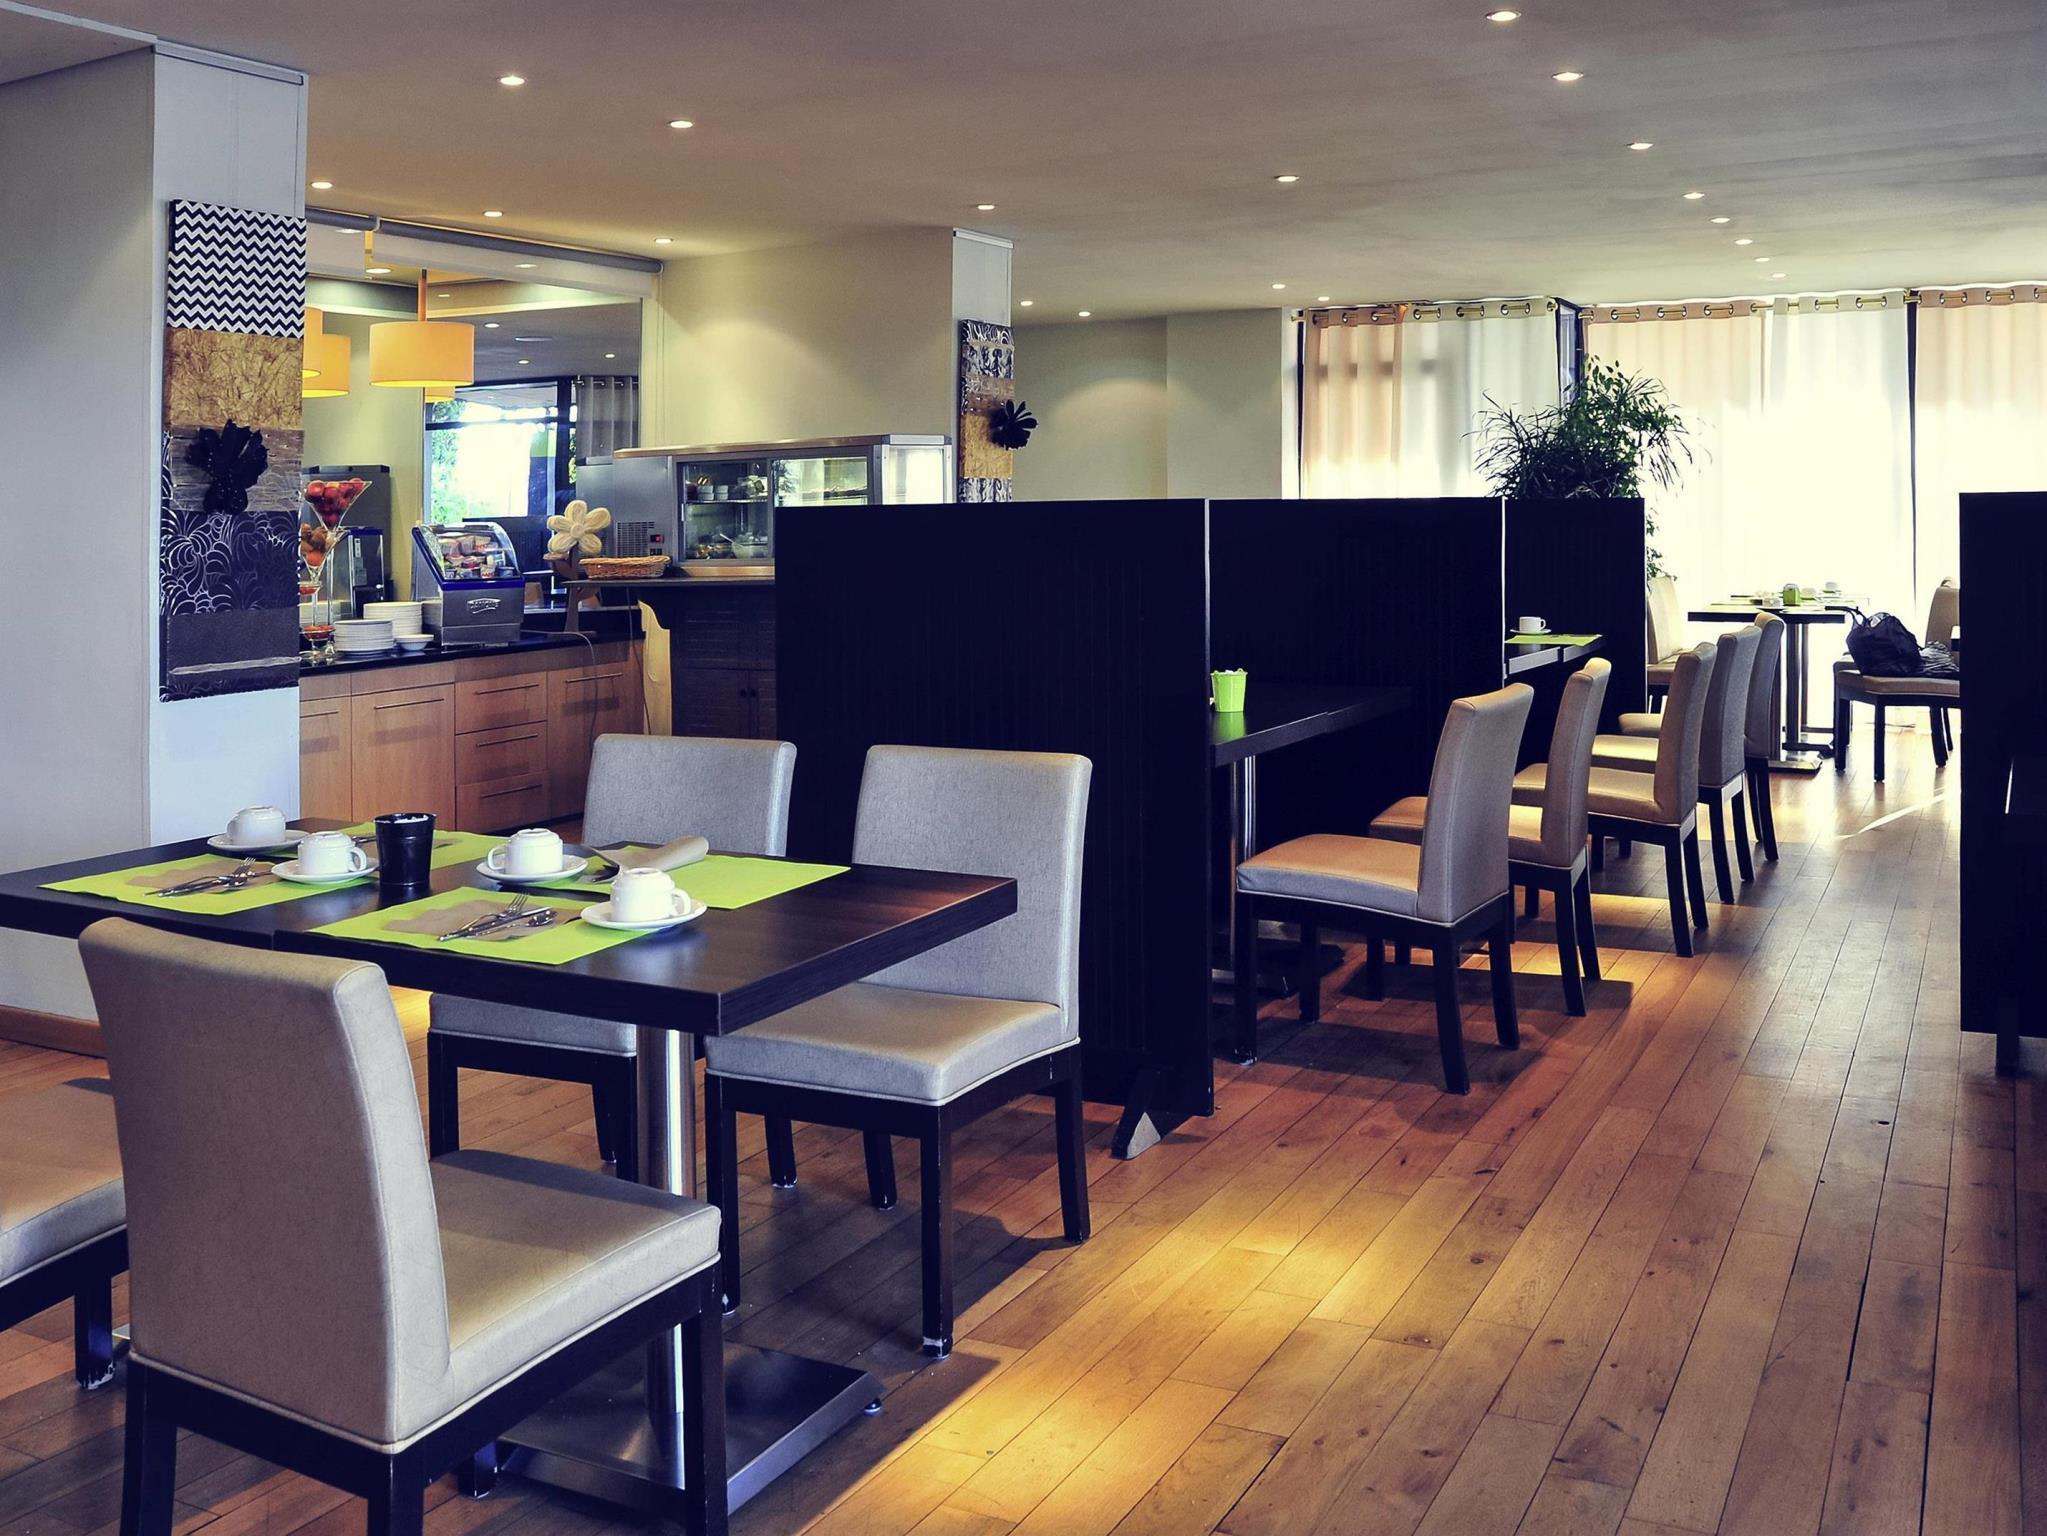 Mercure Montpellier Centre Comedie Hotel